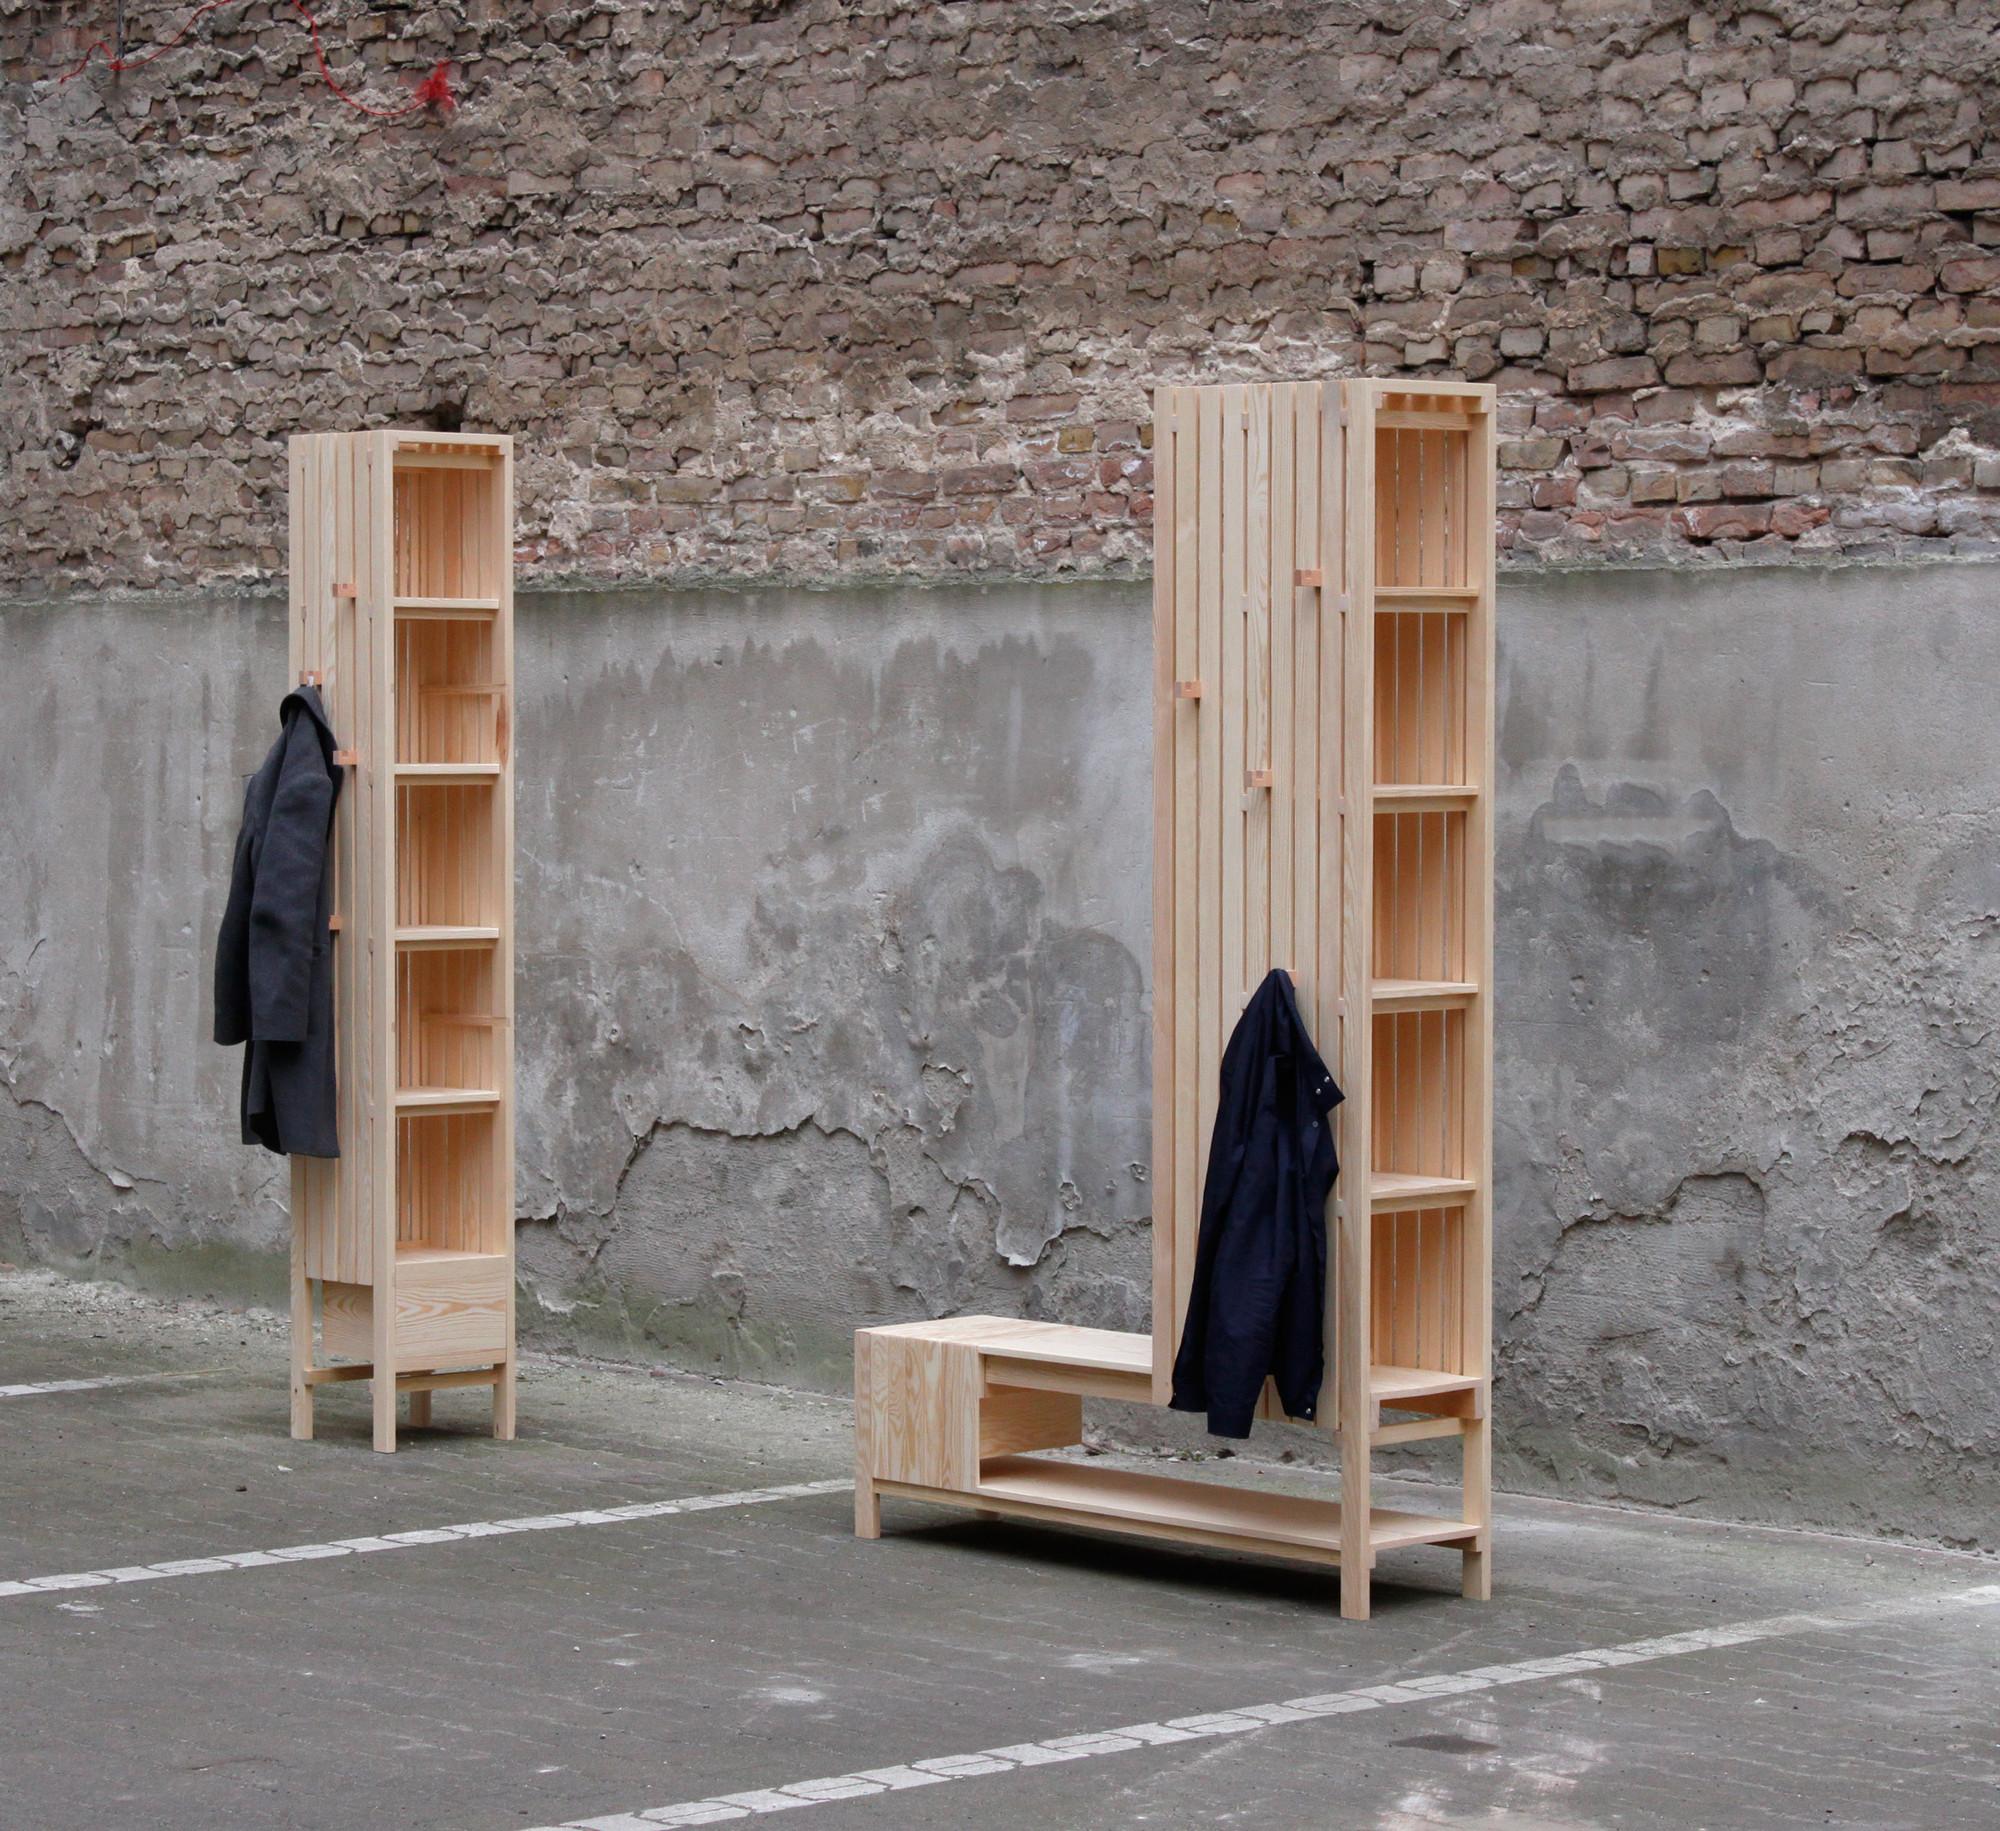 Mobiliário de uso misto / Sebastián Erazo Fischer, © Laure Garcia Castelli